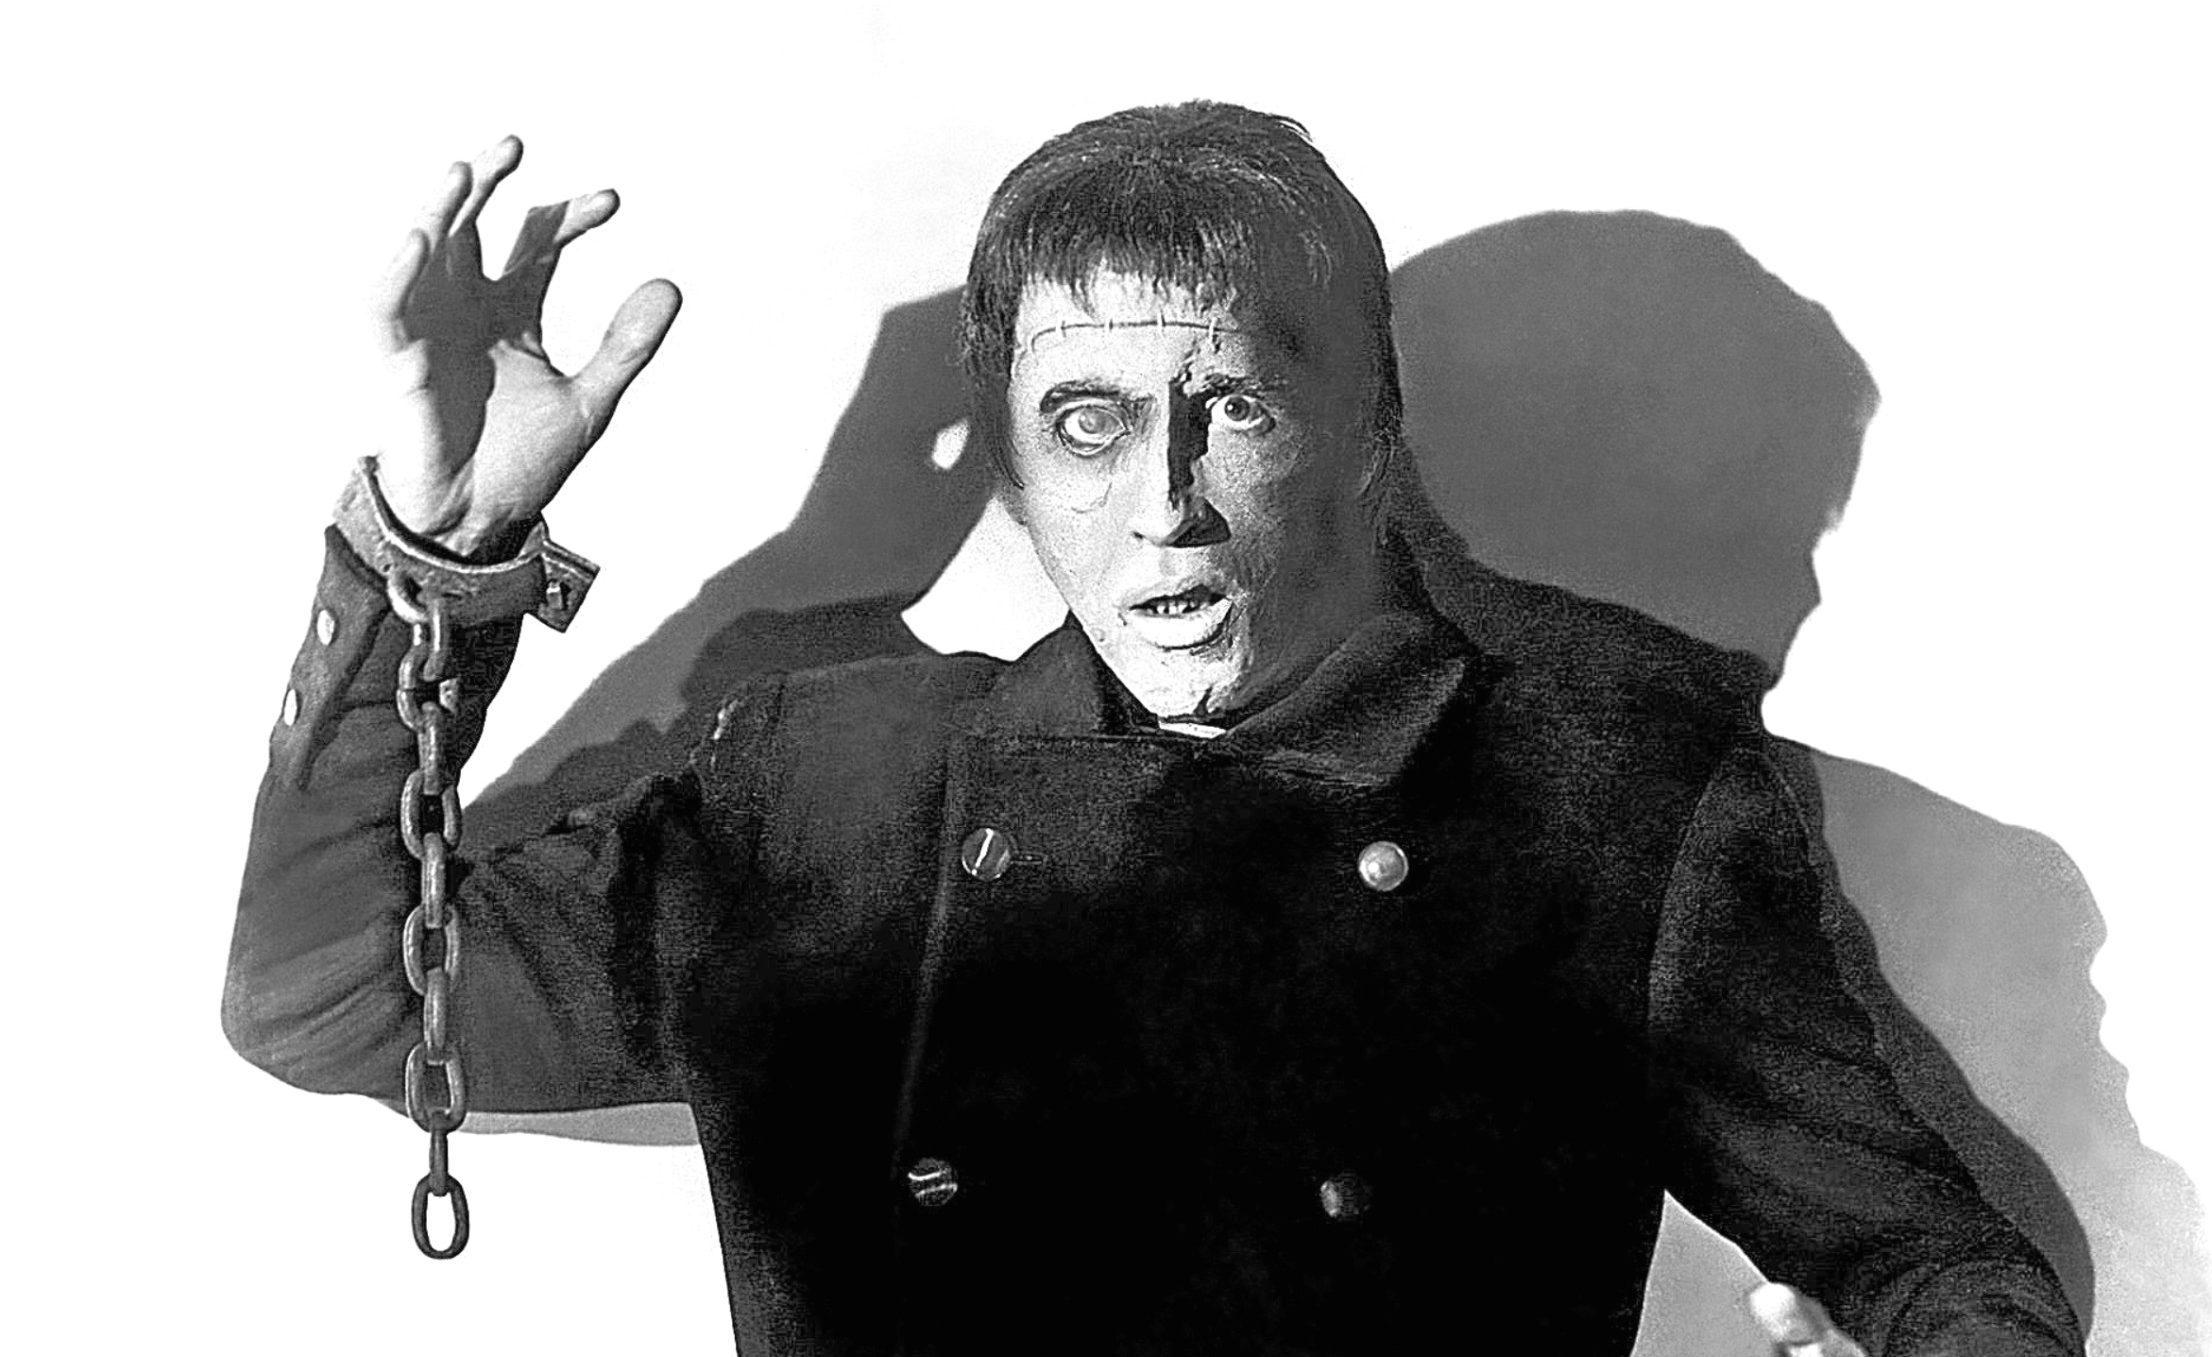 Peter Cushing in 'THE CURSE OF FRANKENSTEIN', 1957 (Allstar/HAMMER FILM)